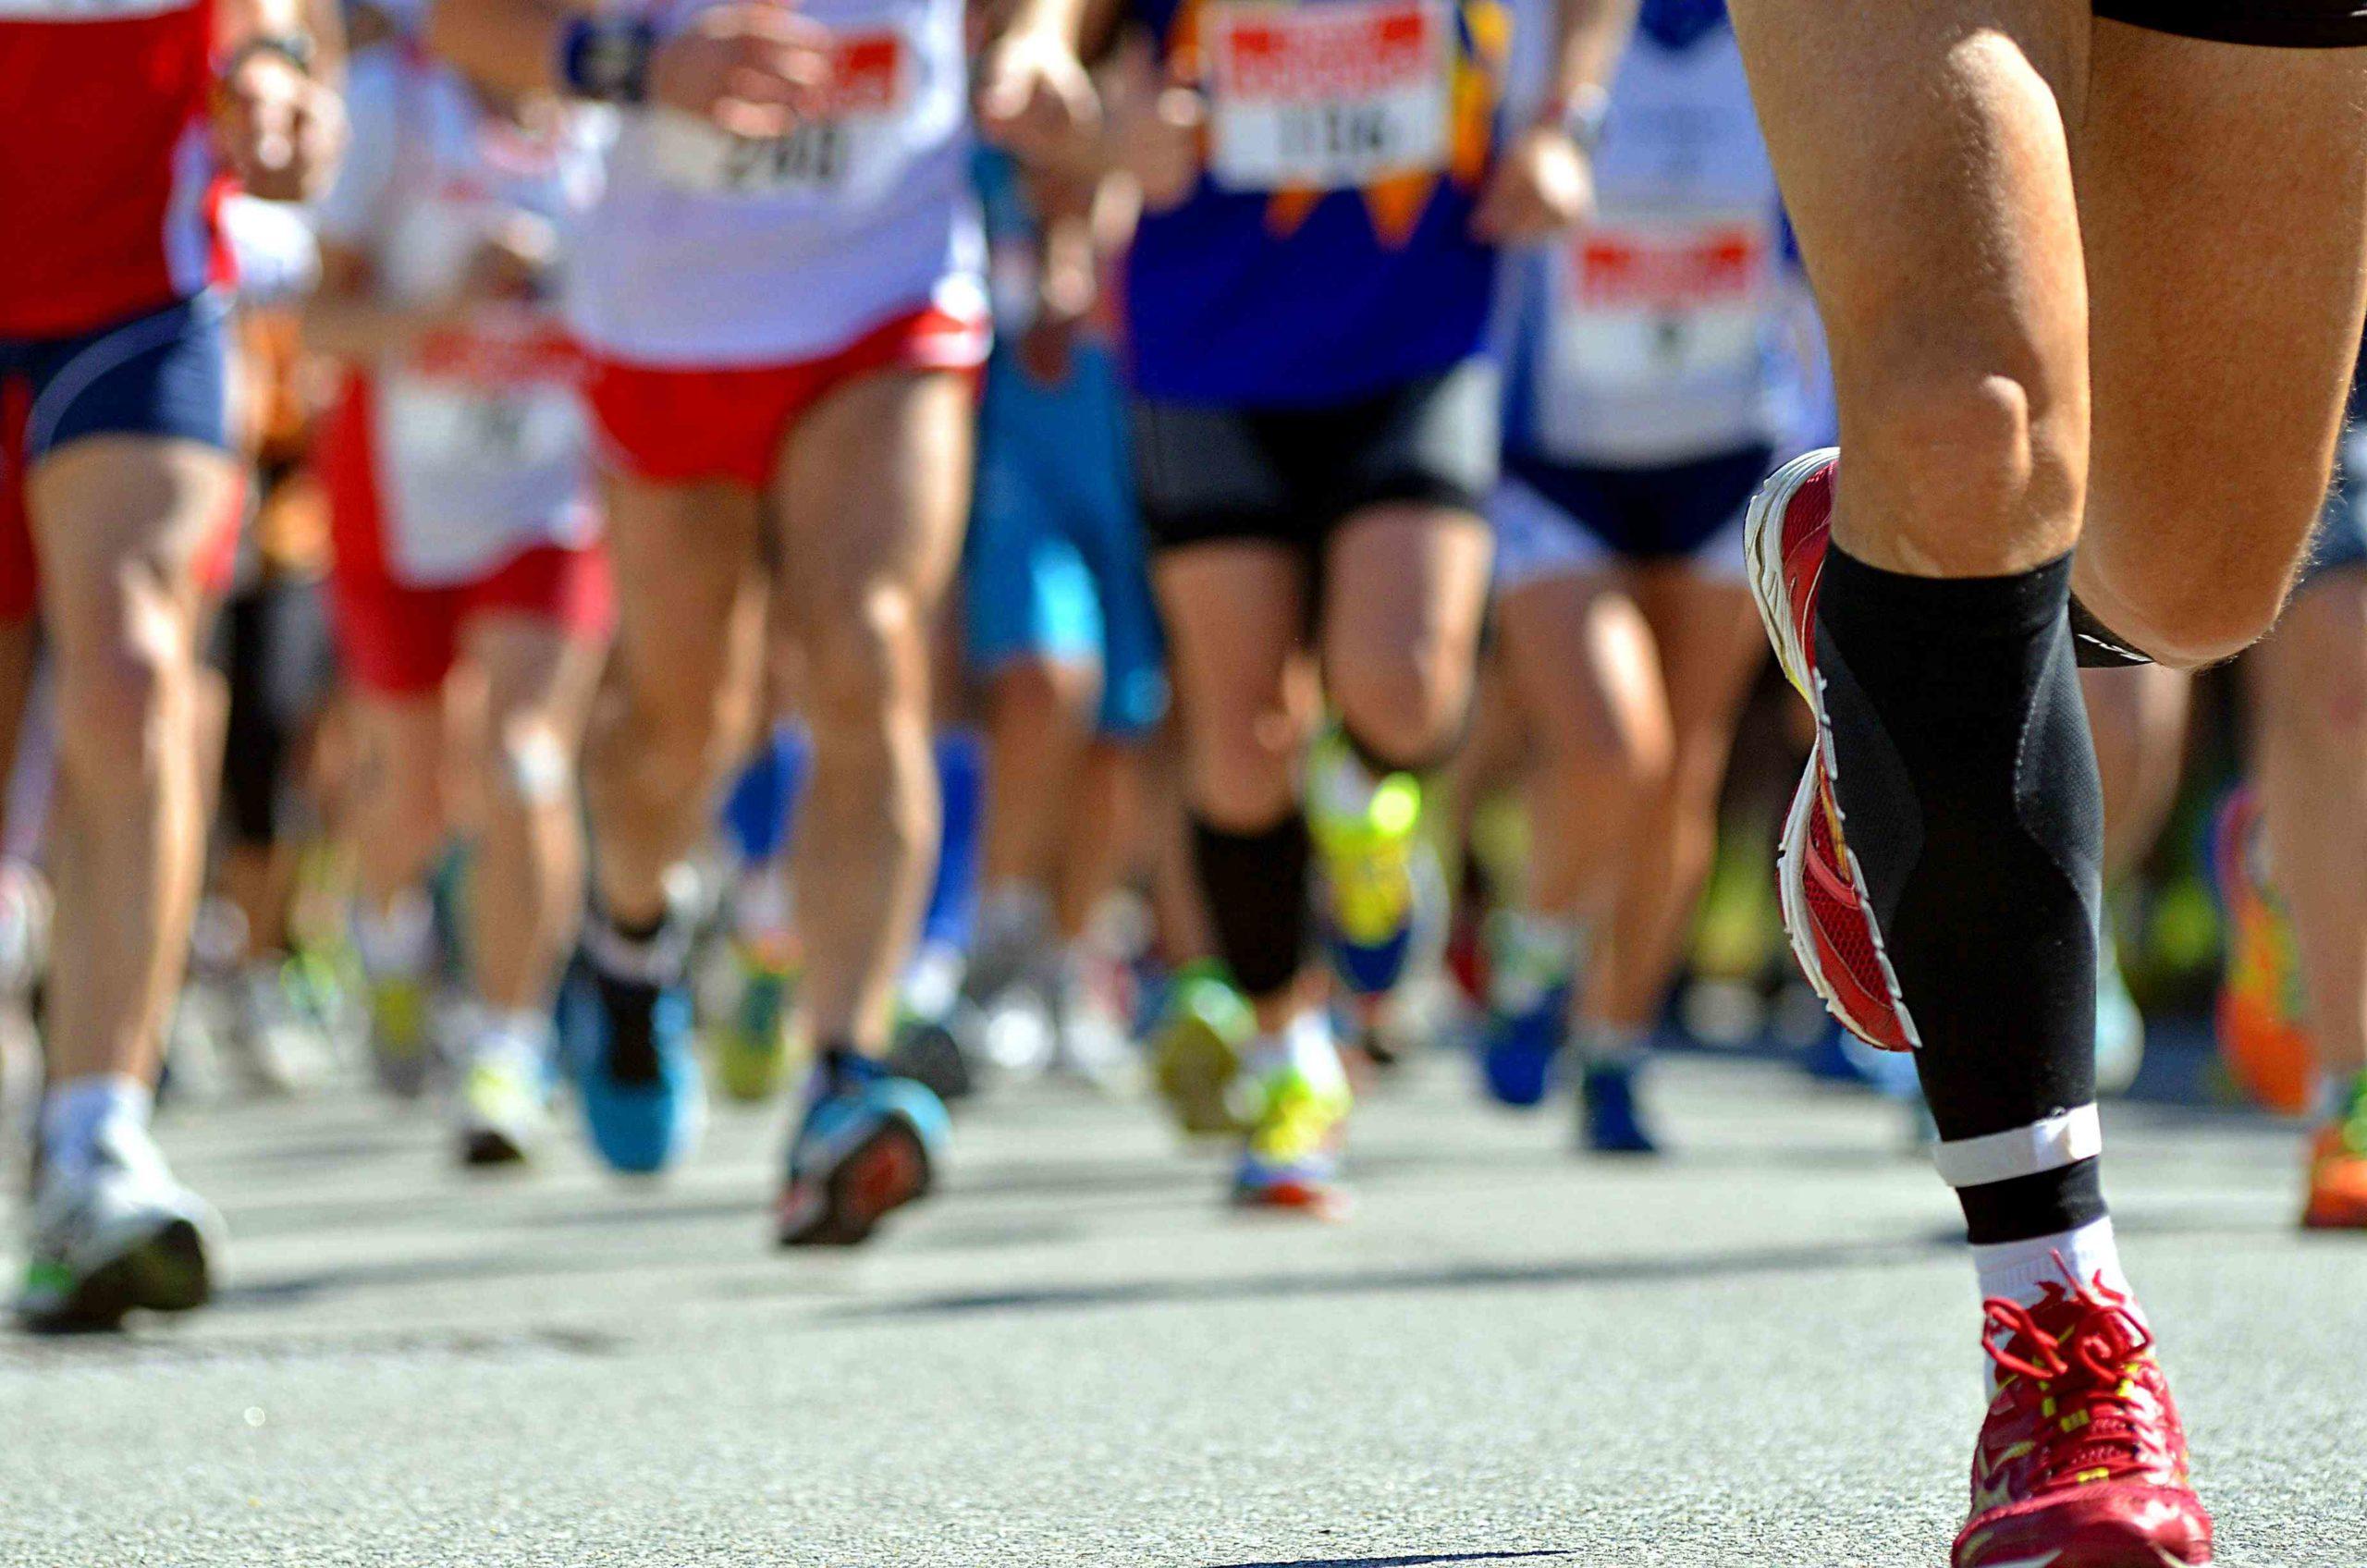 low-section-of-people-running-on-street-in-marathon-691137951-fe6503aa02724ef392d189da26adb339